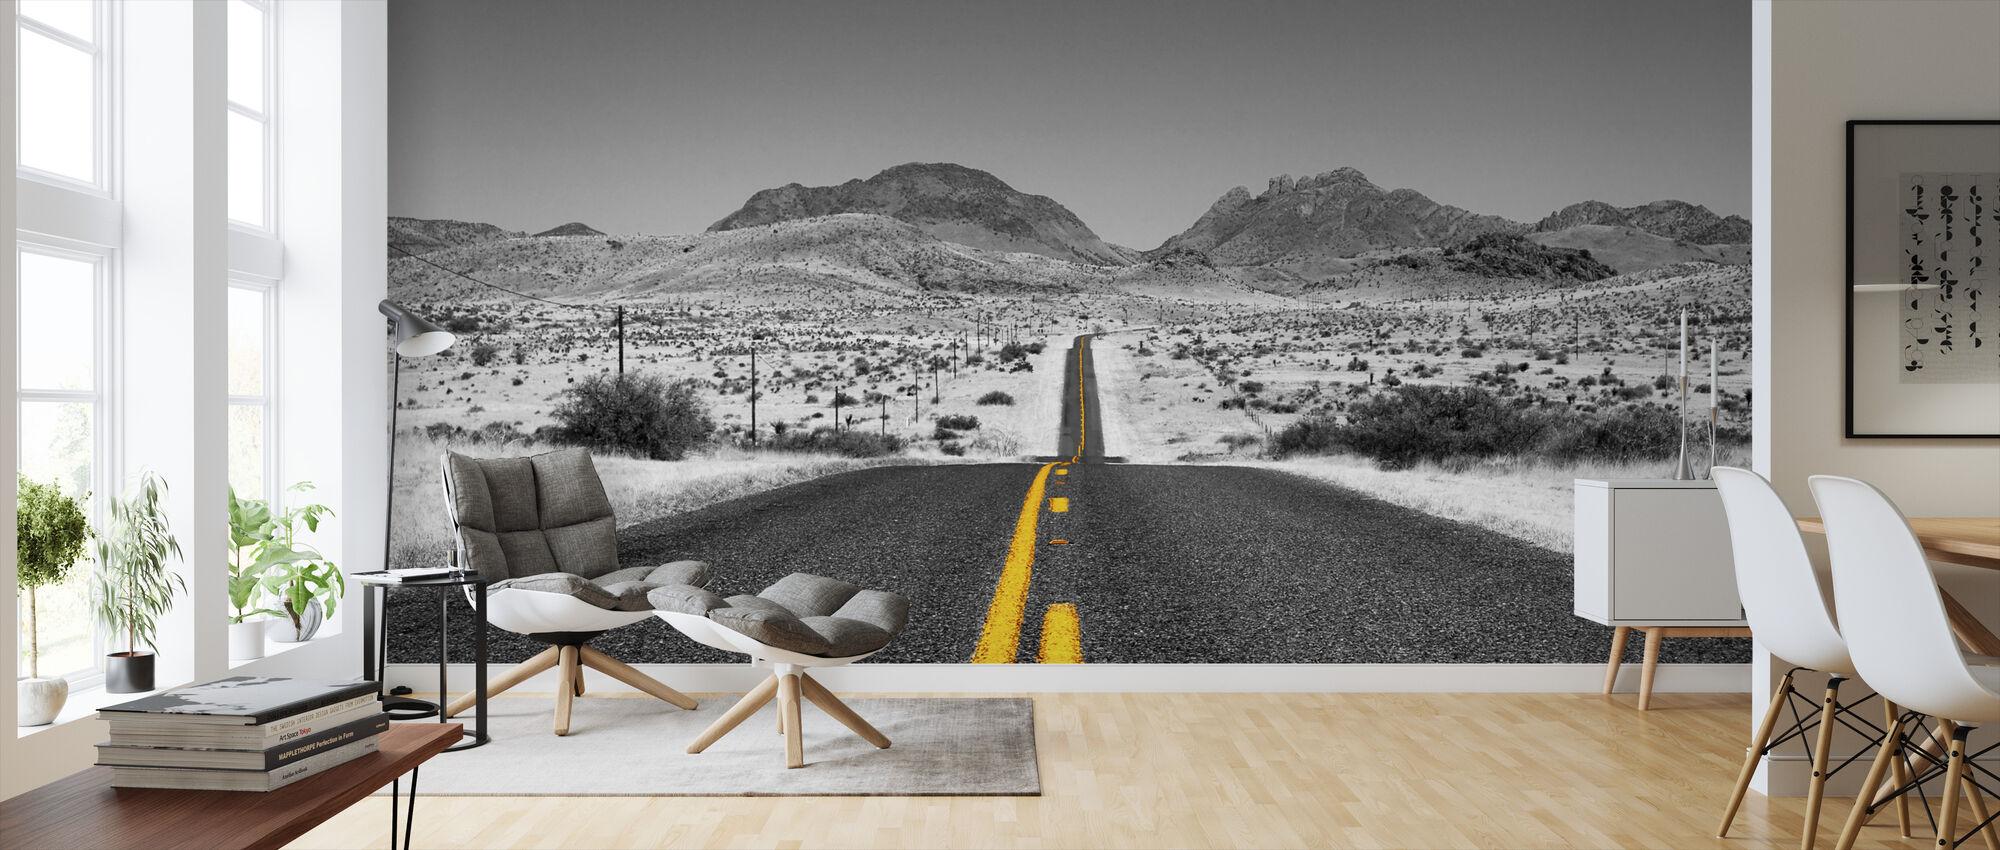 Lost Highway - Colorsplash - Wallpaper - Living Room